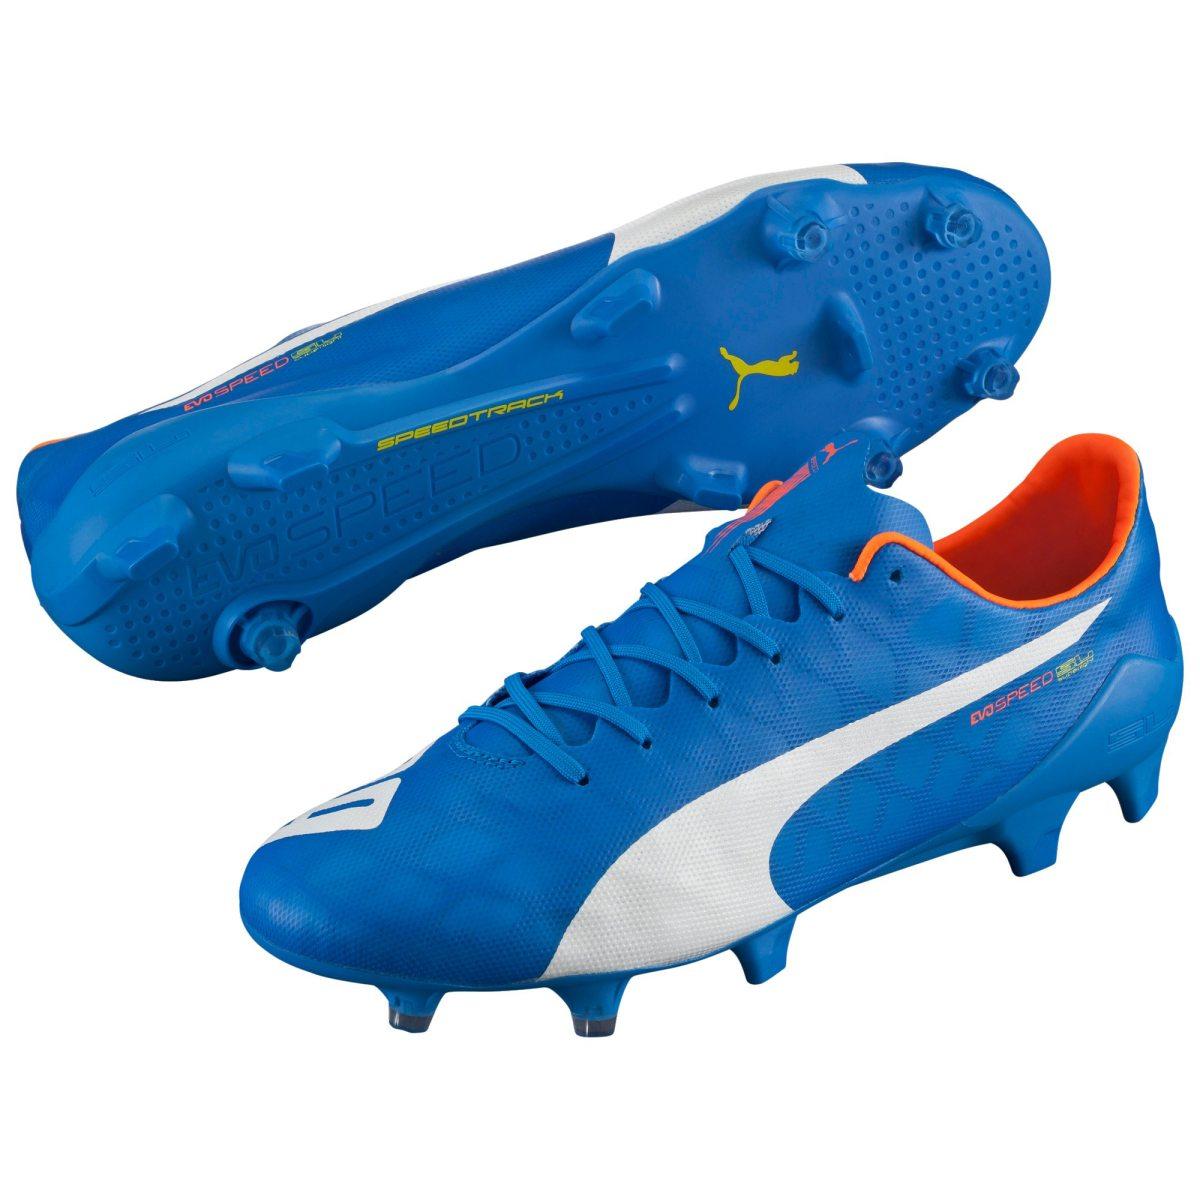 reputable site a4f6f b2ec2 blå puma evospeed 1.4 sl fg fotbollssko senior fotbollsskor